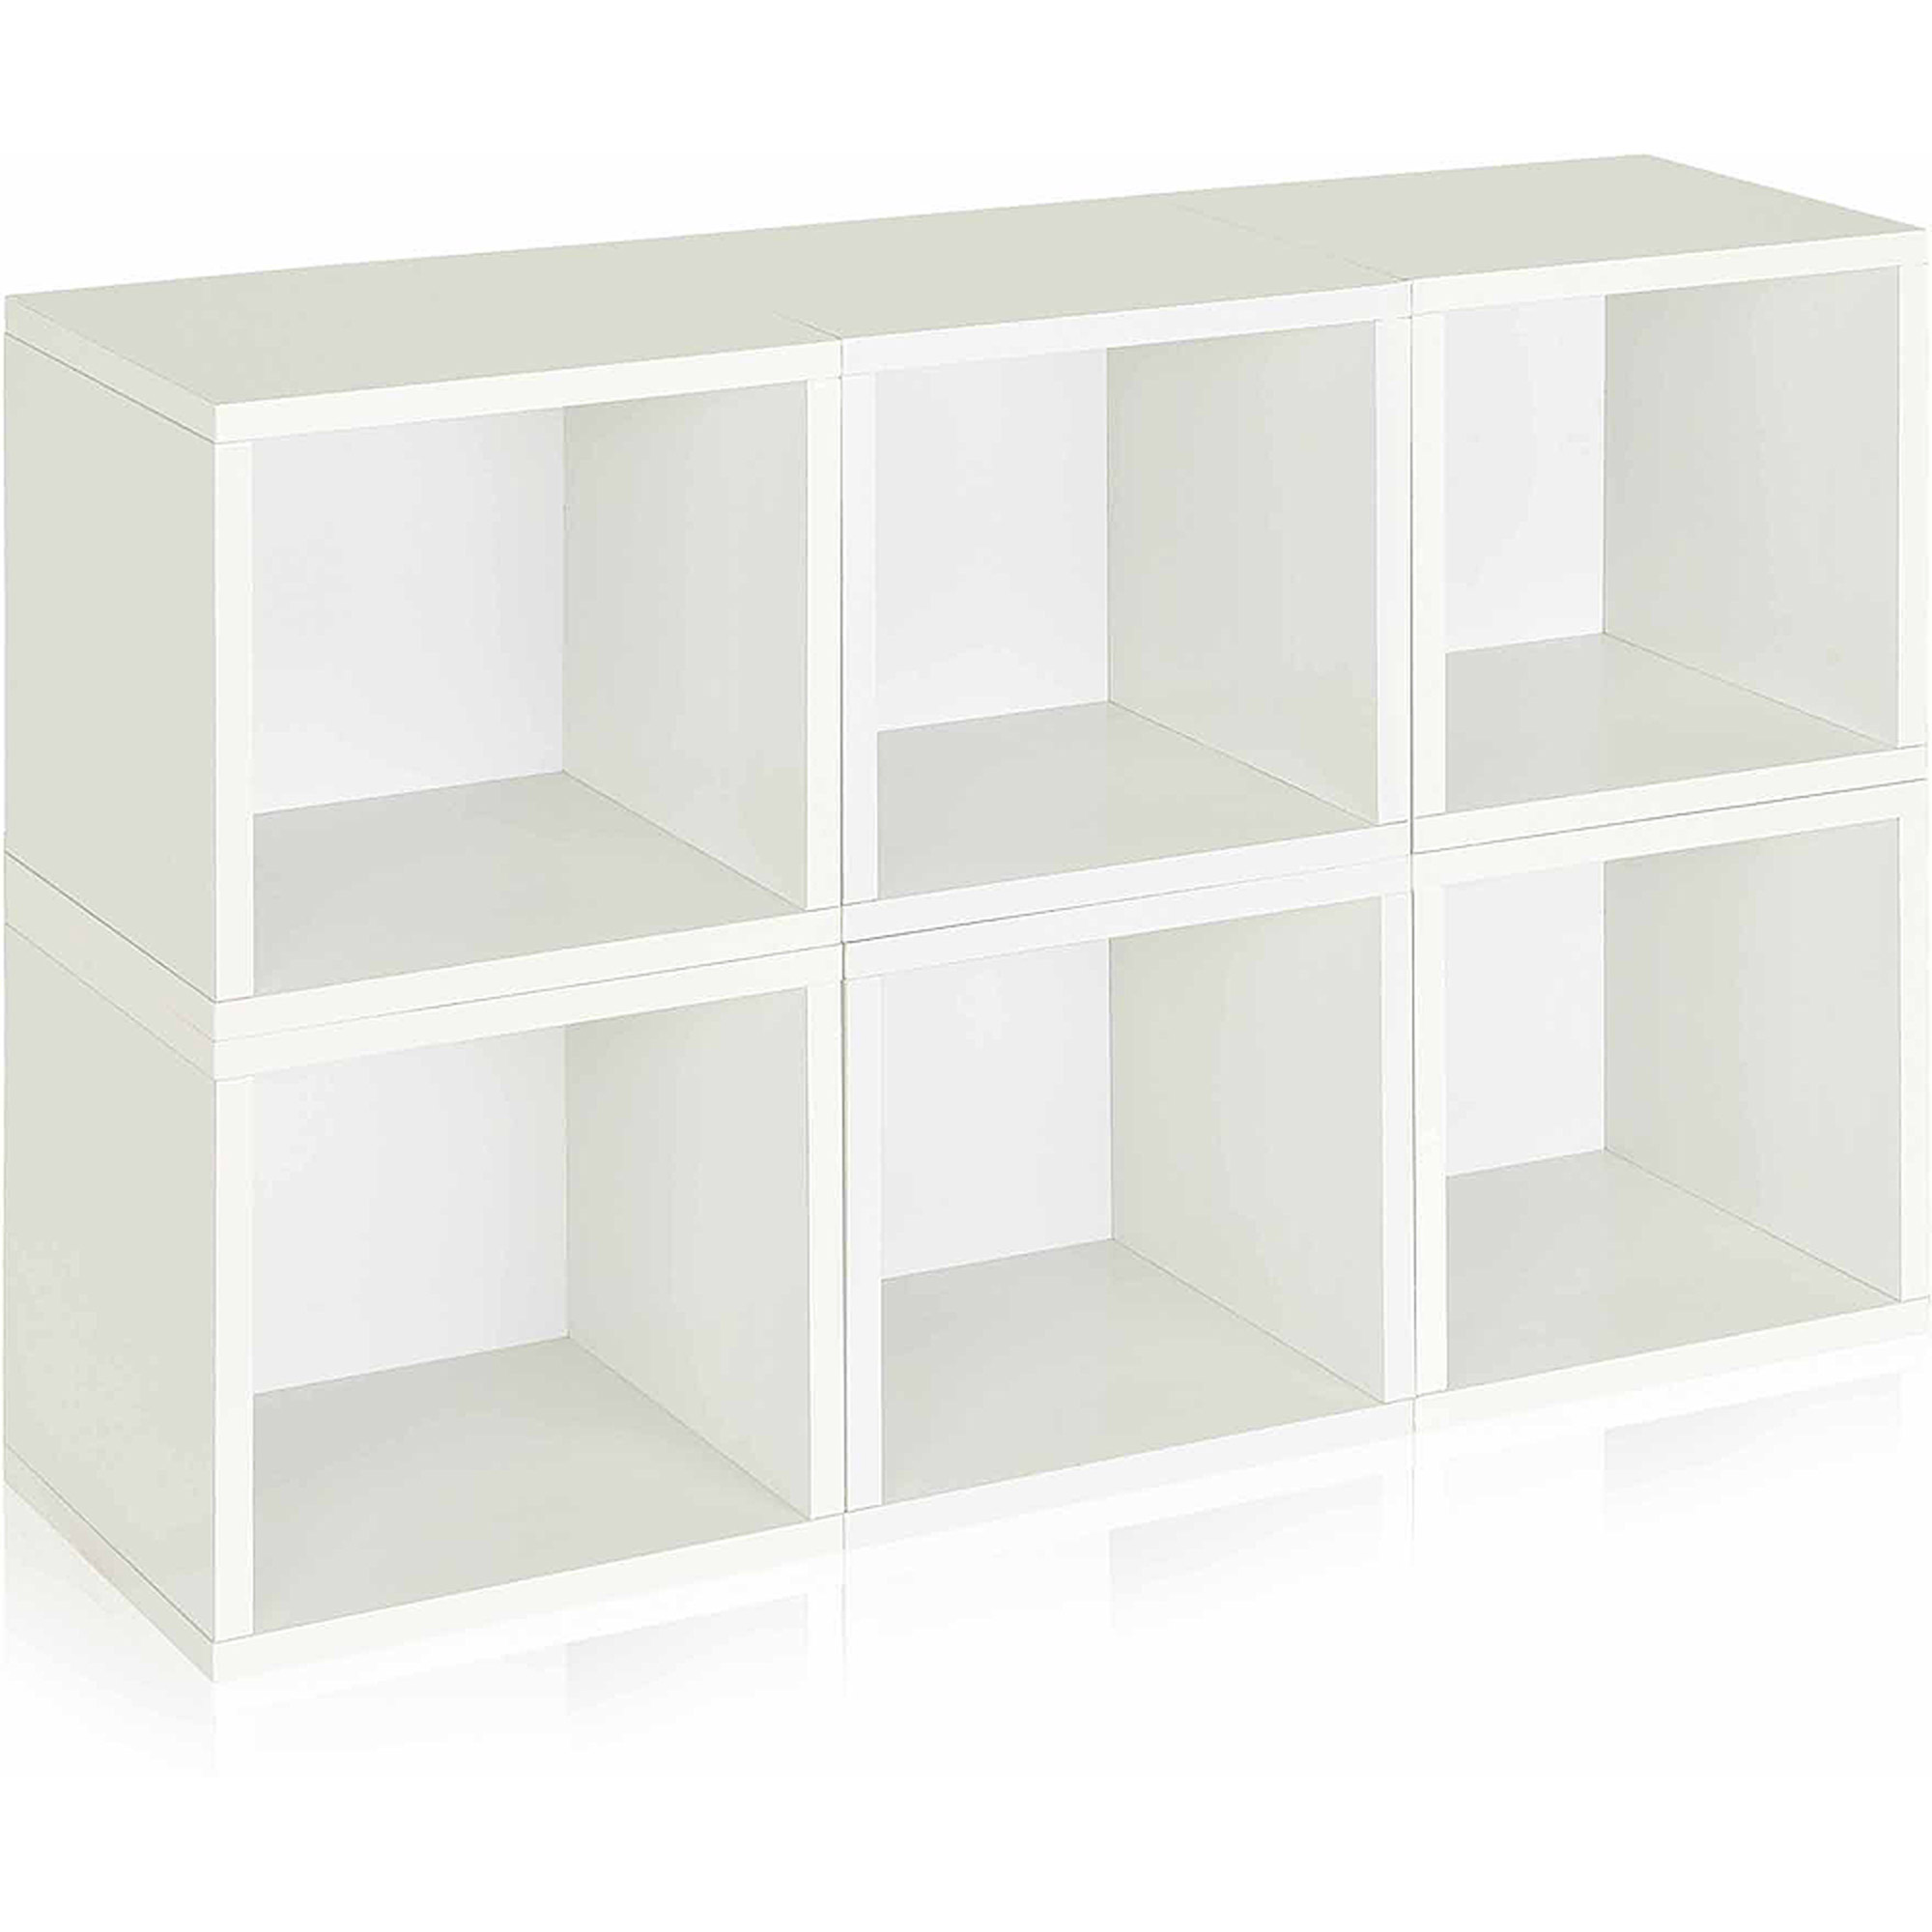 Way Basics Eco Stackable Modular Storage Cubes, White, 6-Pack